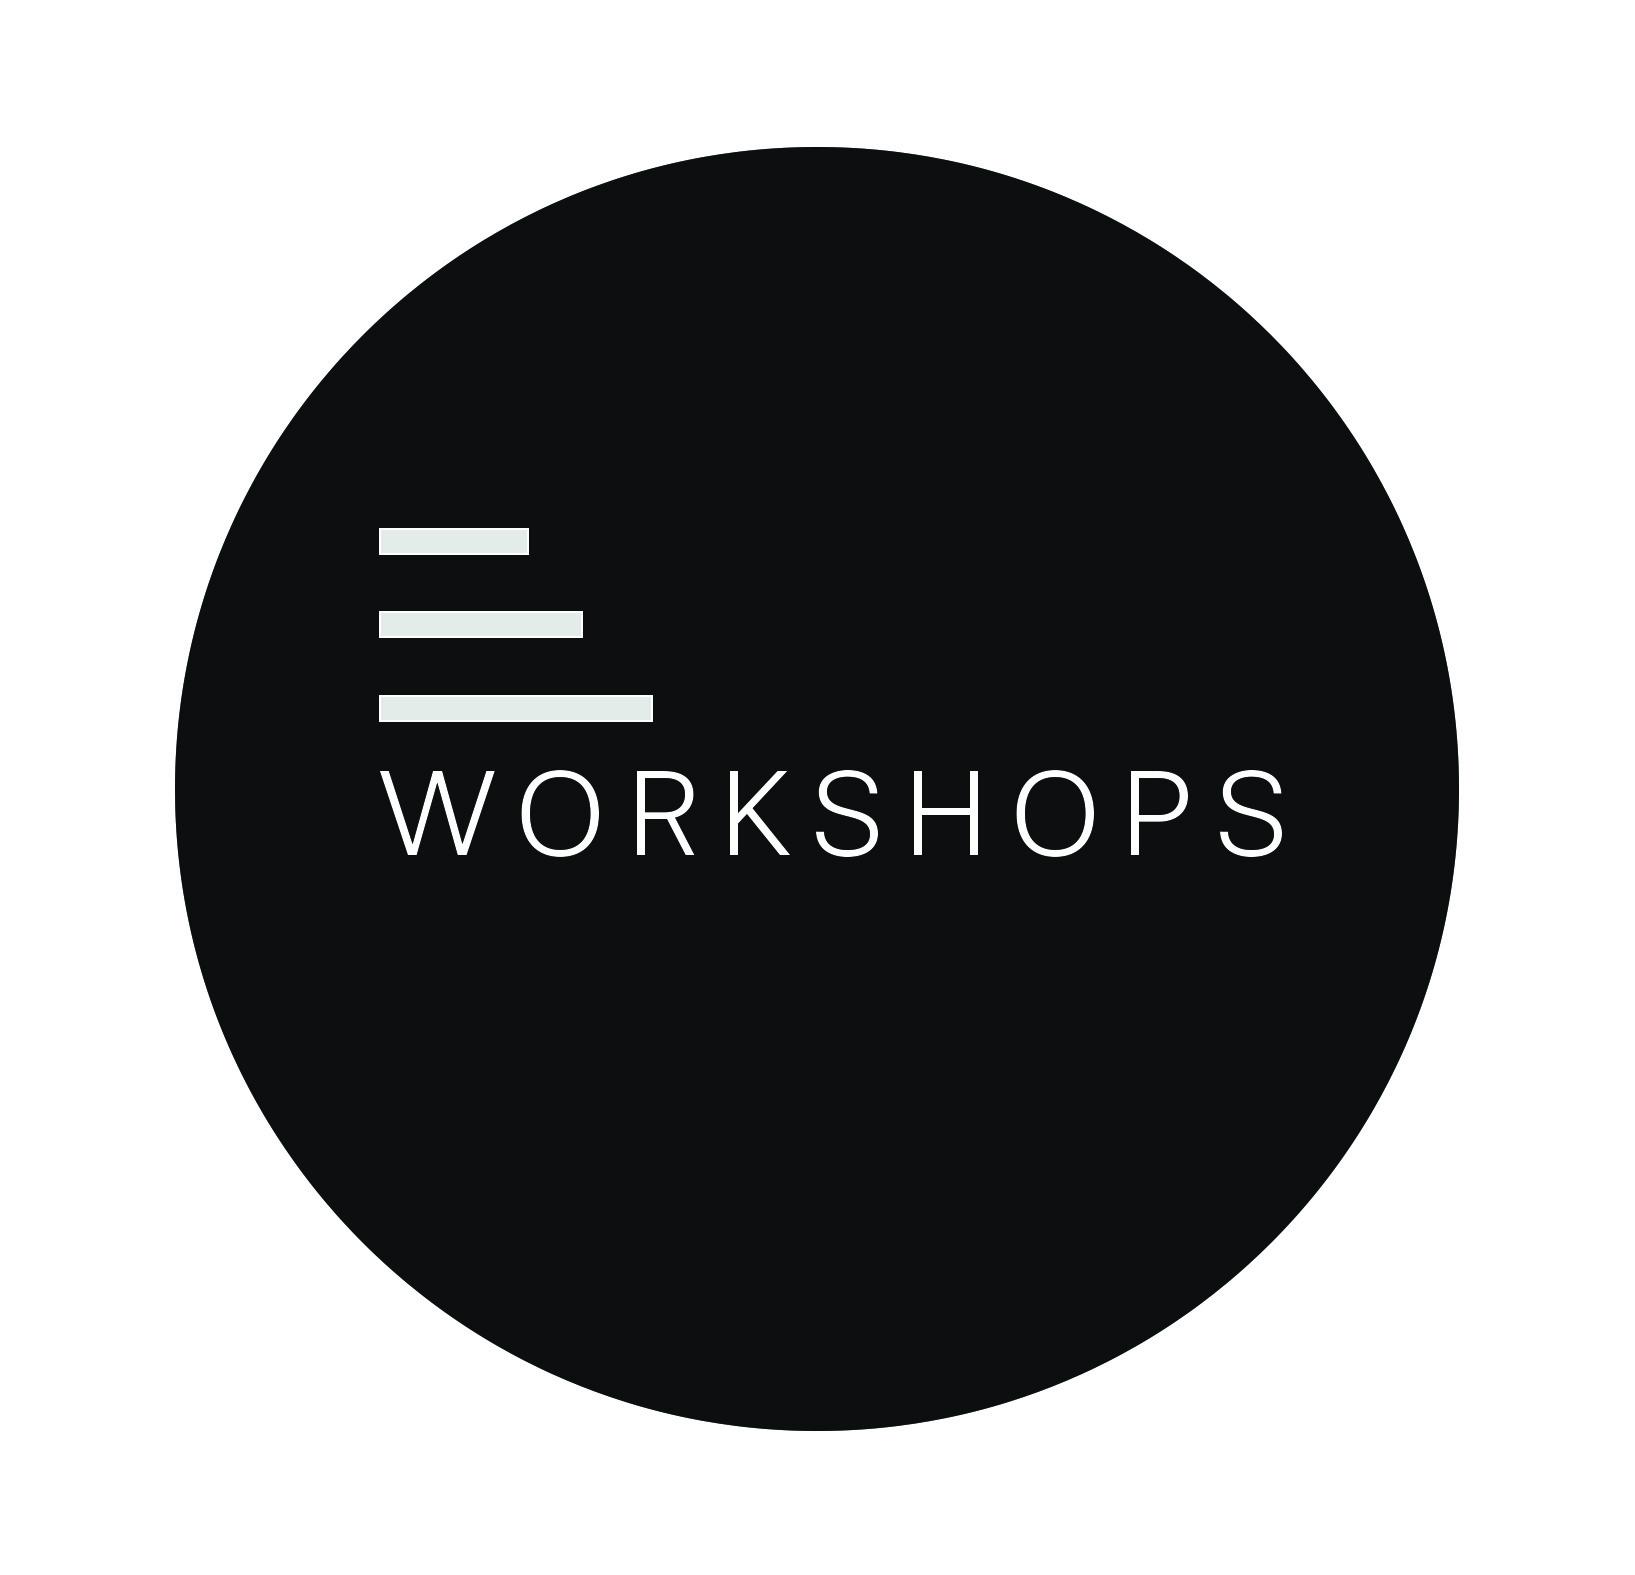 workshopscircle.jpg